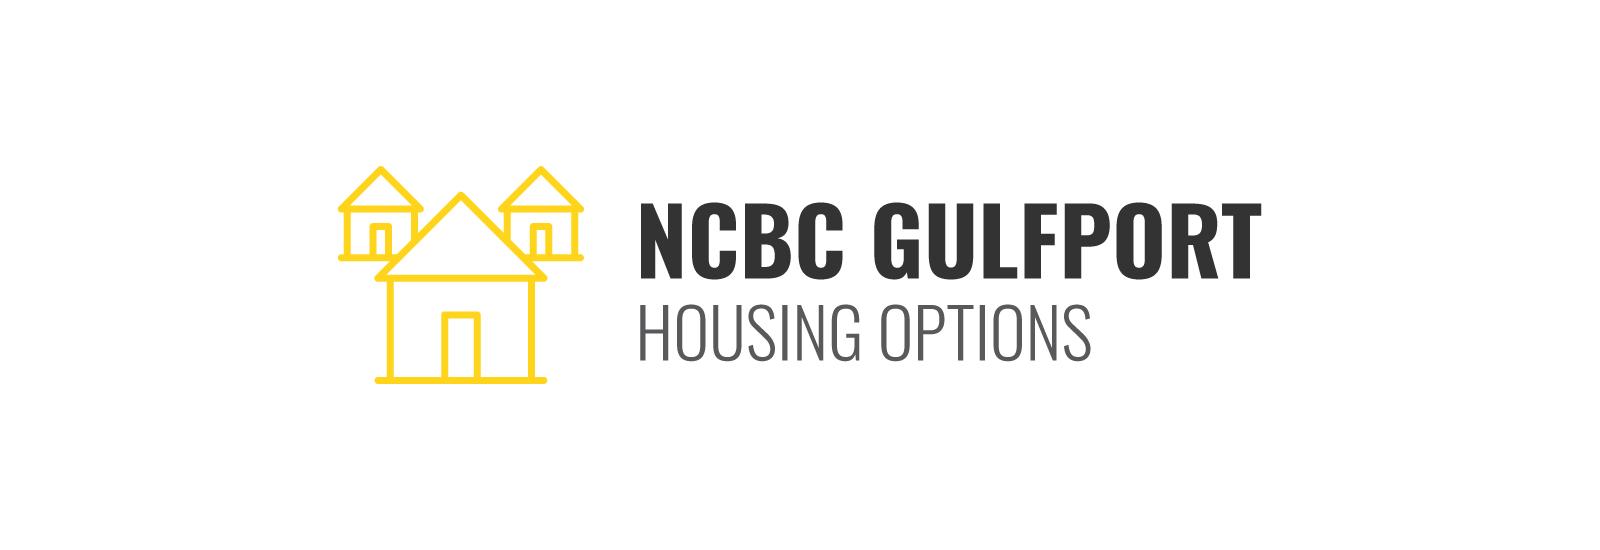 NCBC Gulfport Housing Options